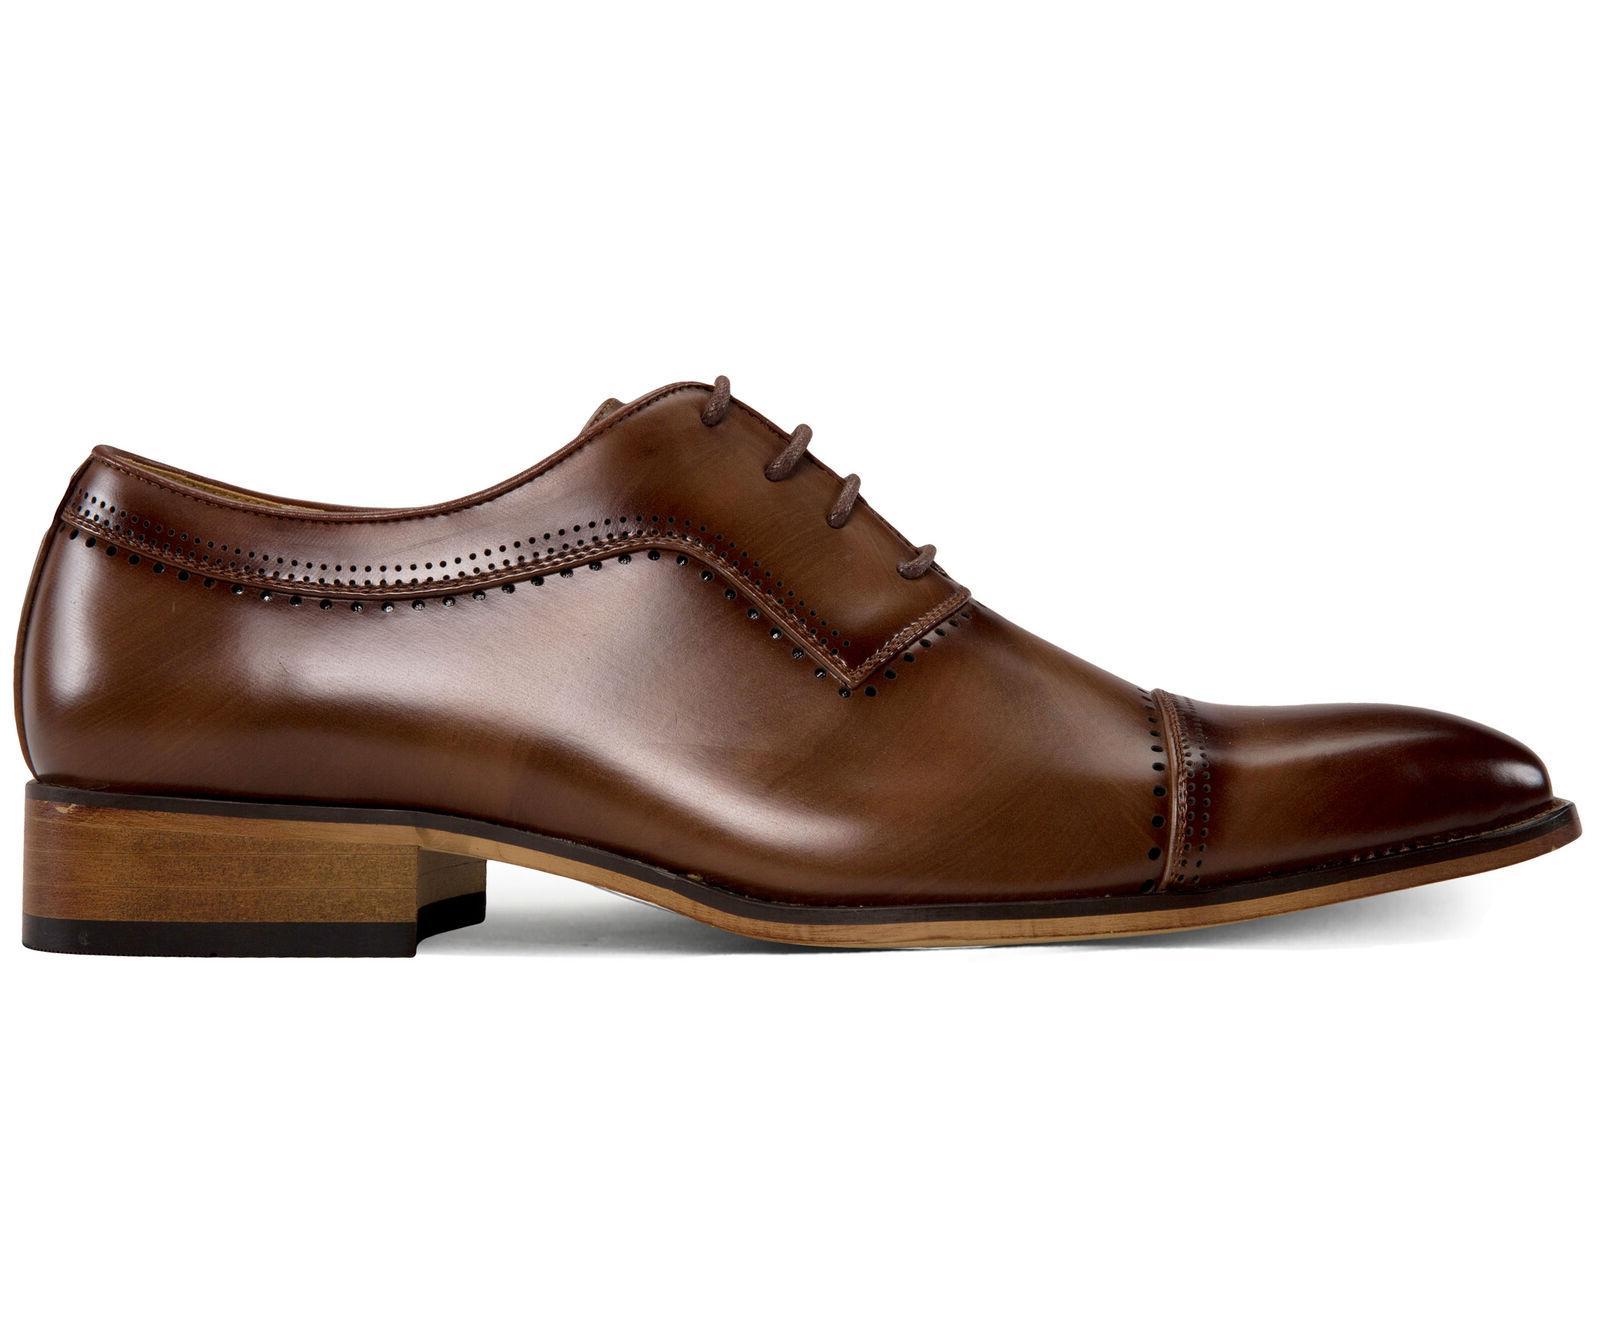 Mens Dress - Oxford - Lace Up Shoes